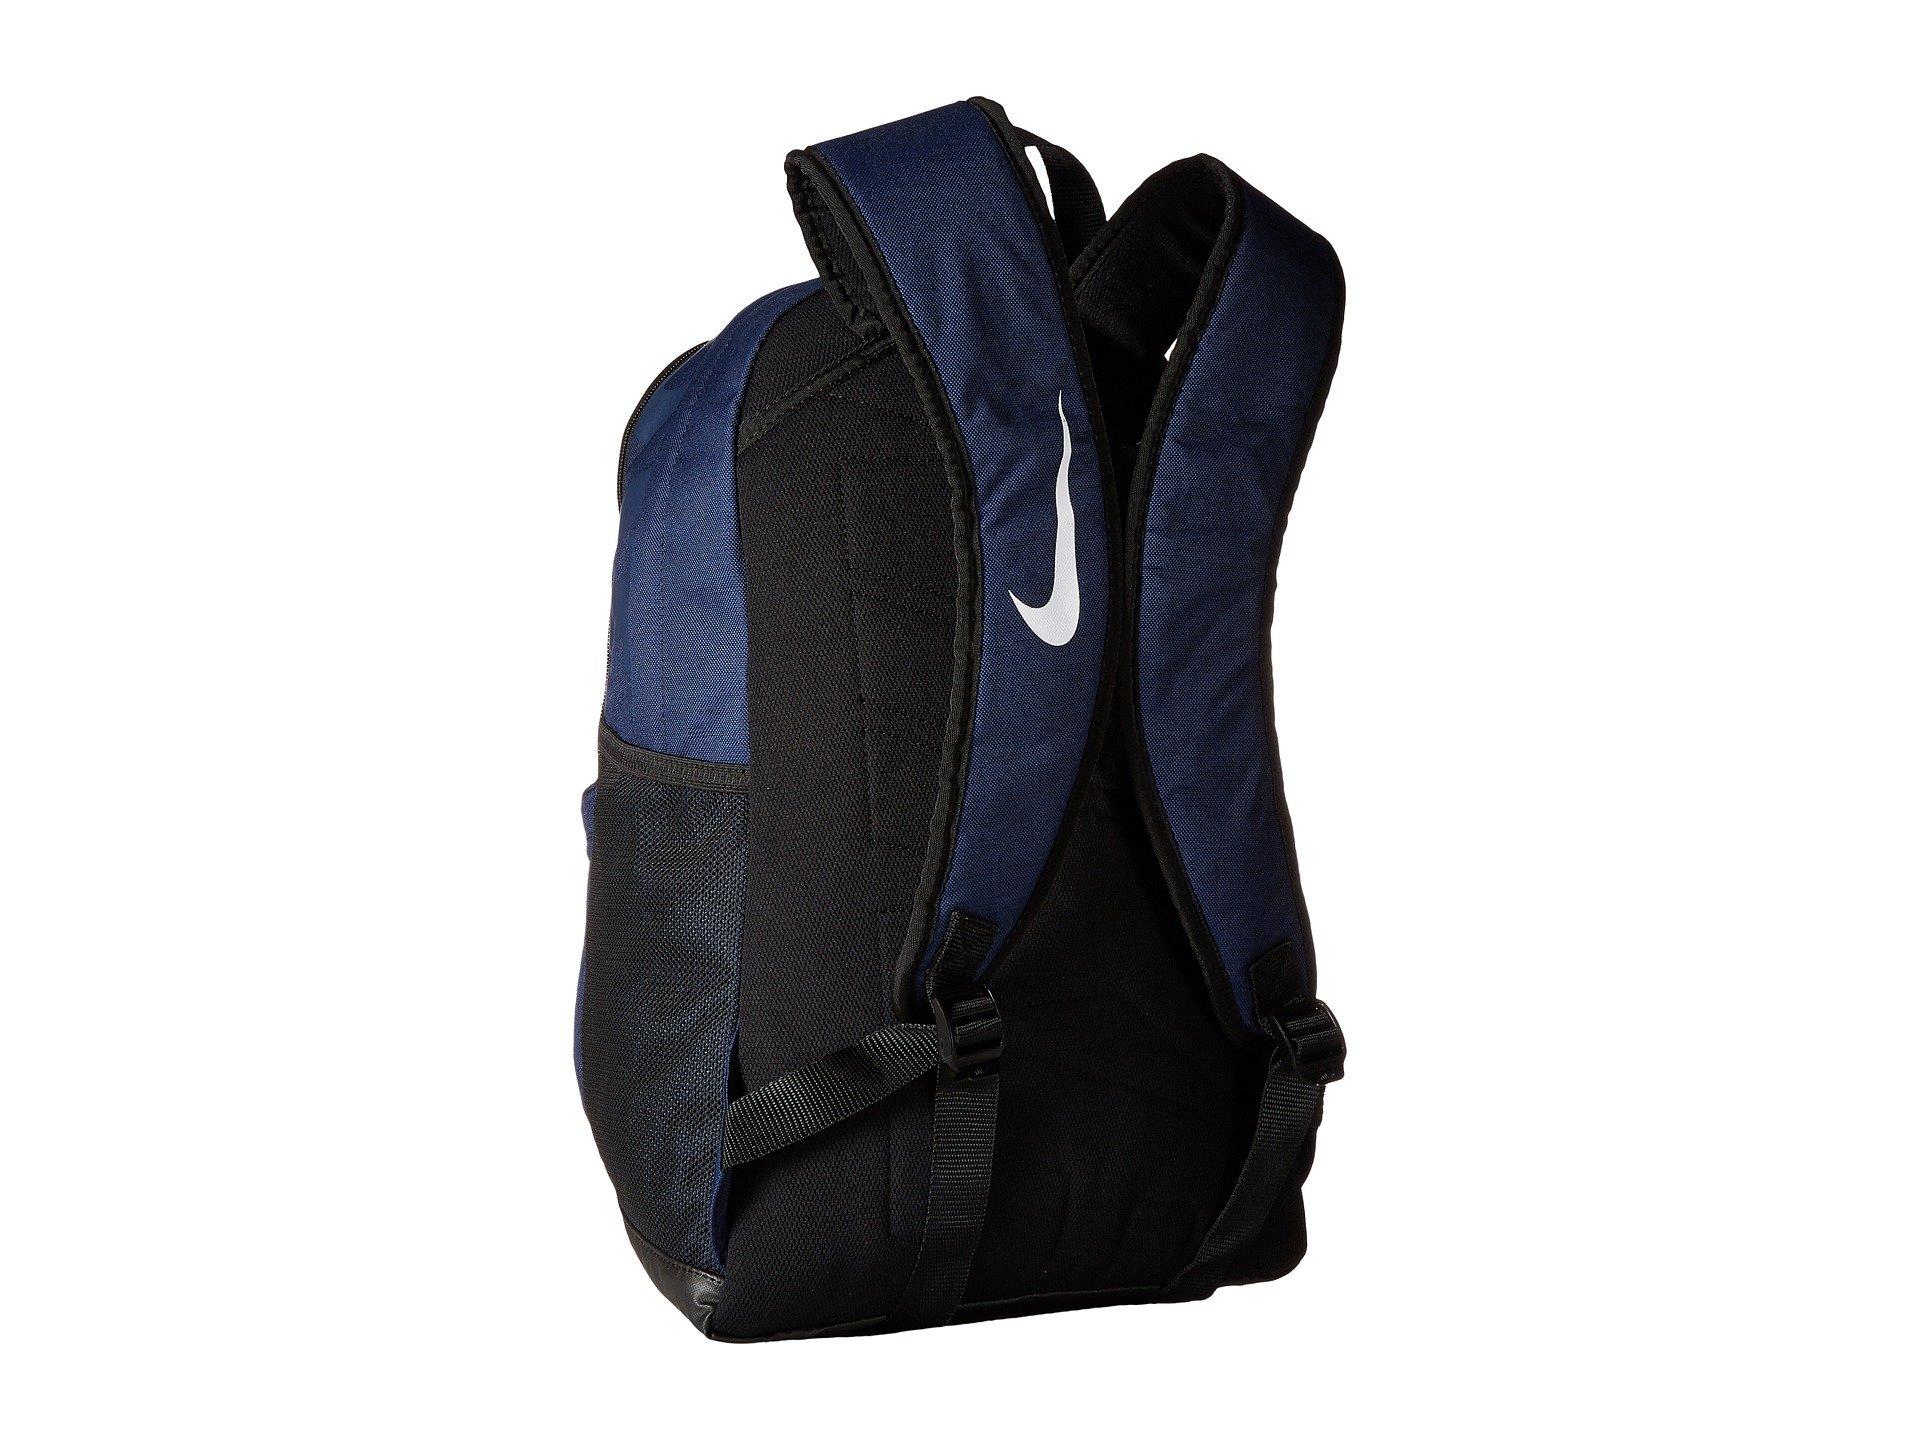 Medium black Navy Backpack white Brasilia Nike Midnight PpxwgAHqc